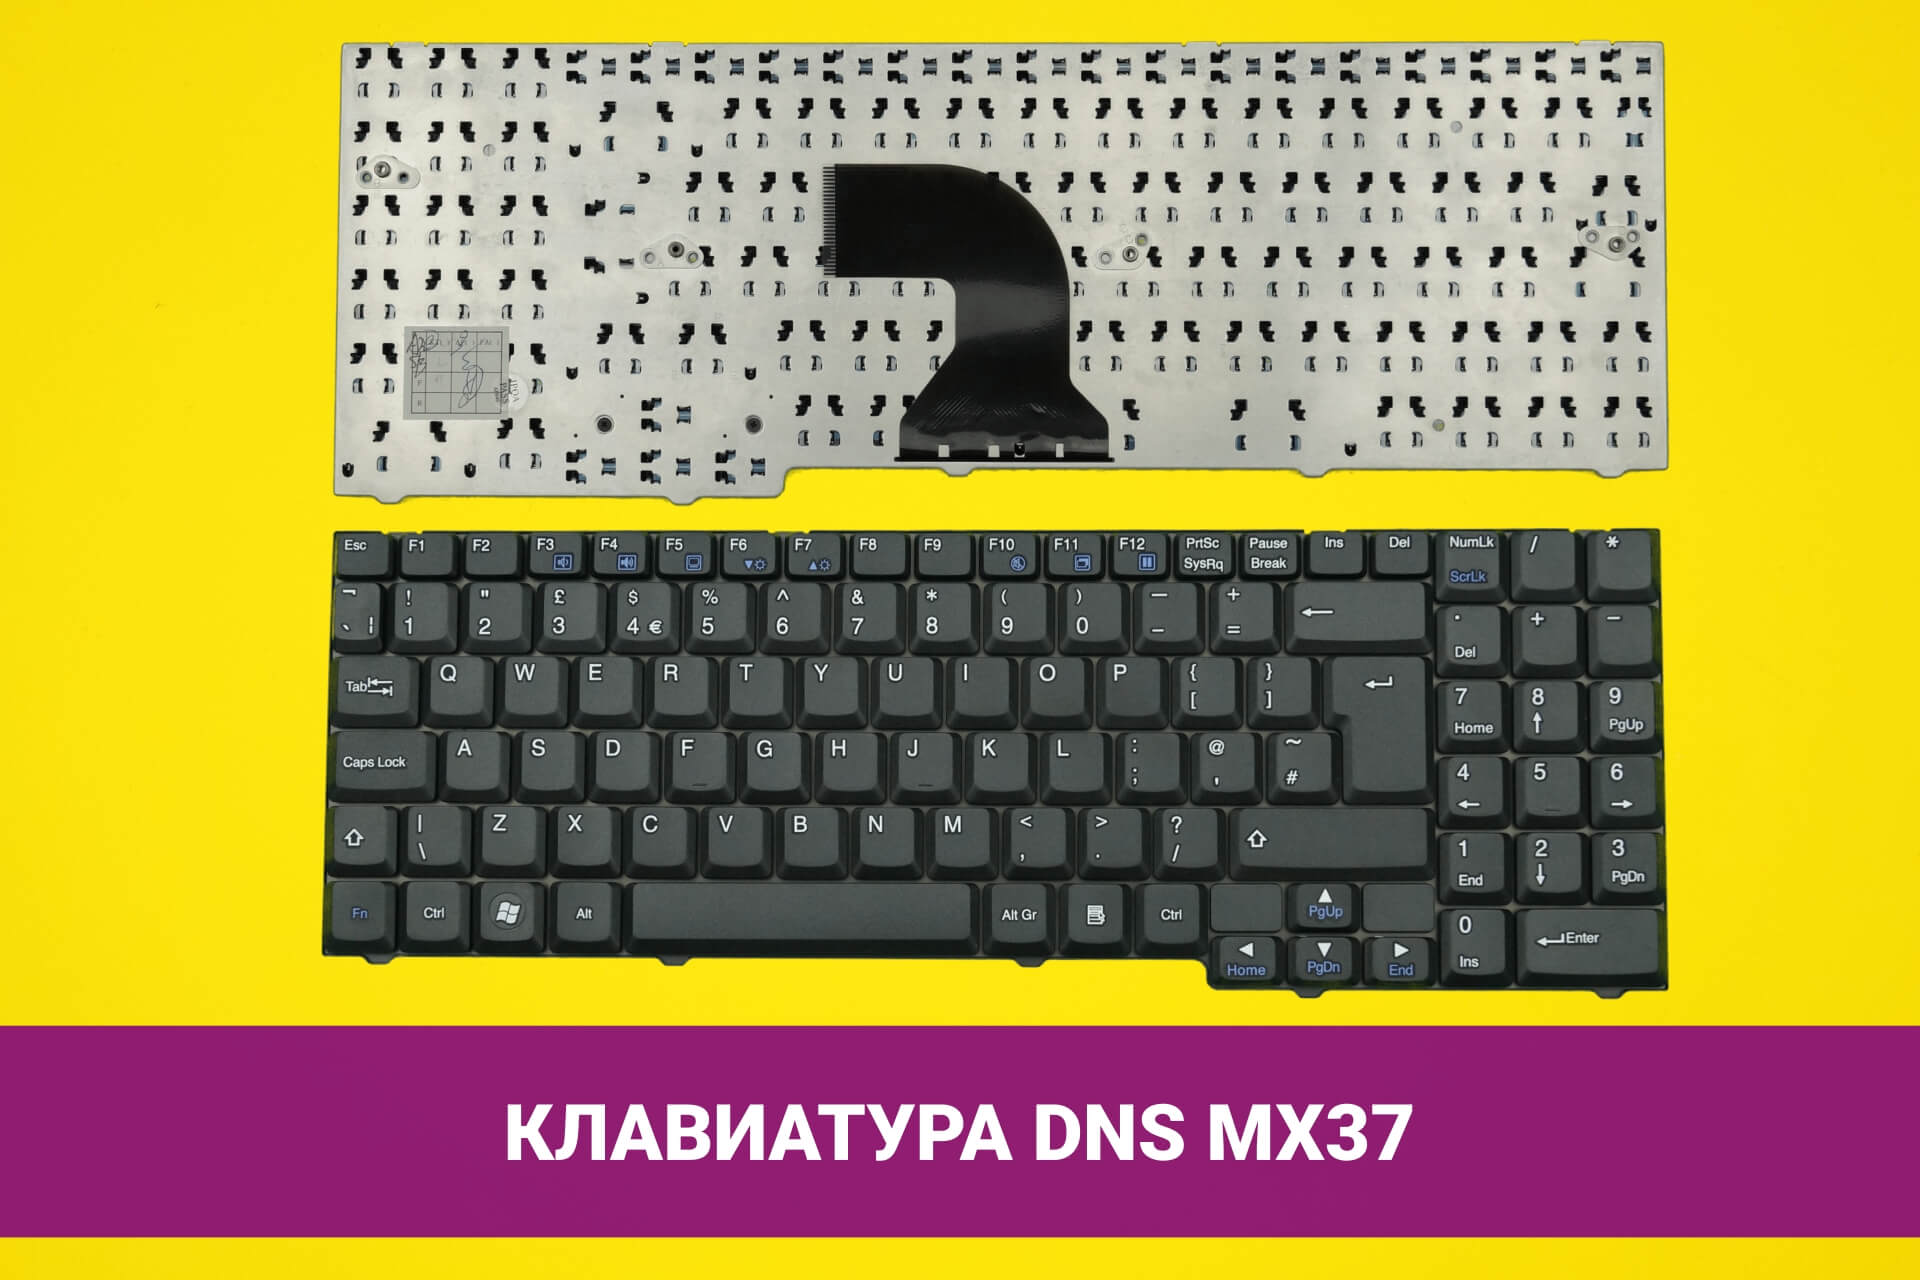 Клавиатура для ноутбука русская Packard Bell EasyNote MX35 MX36 MX37 MX45 MX51 MX52 MX61 MX65 MX66 MX67 MP-03756GB-5283